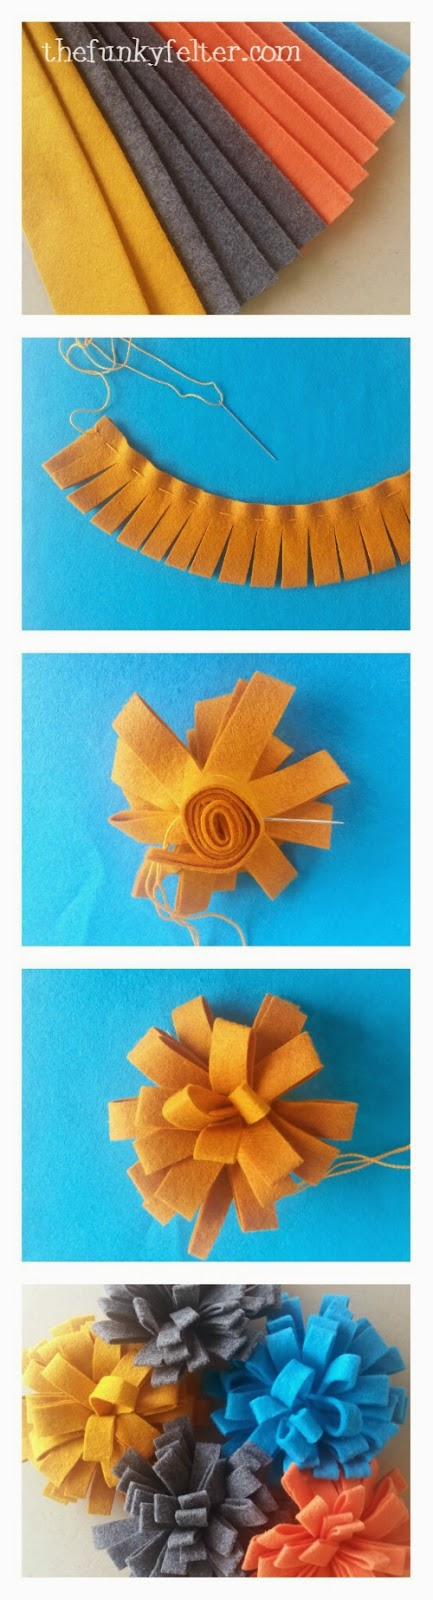 instructographic diy felt flower craft tutorial